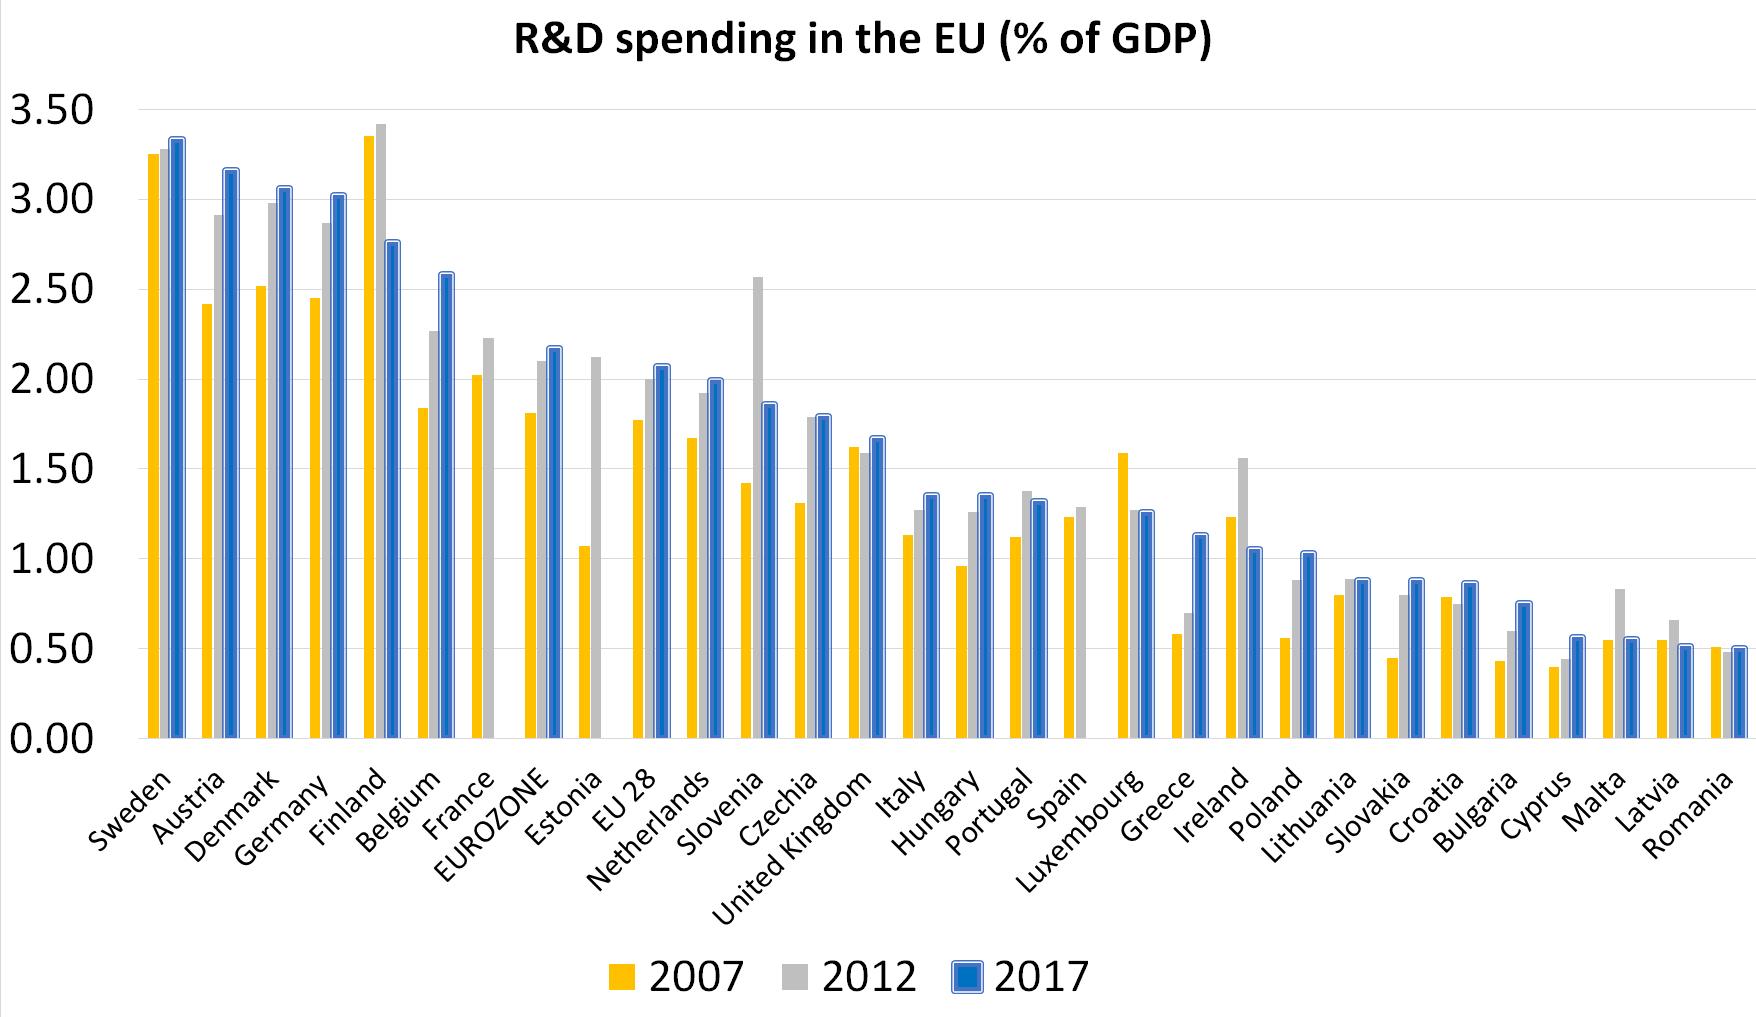 Overall EU R&D spending continues to rise, despite falling public